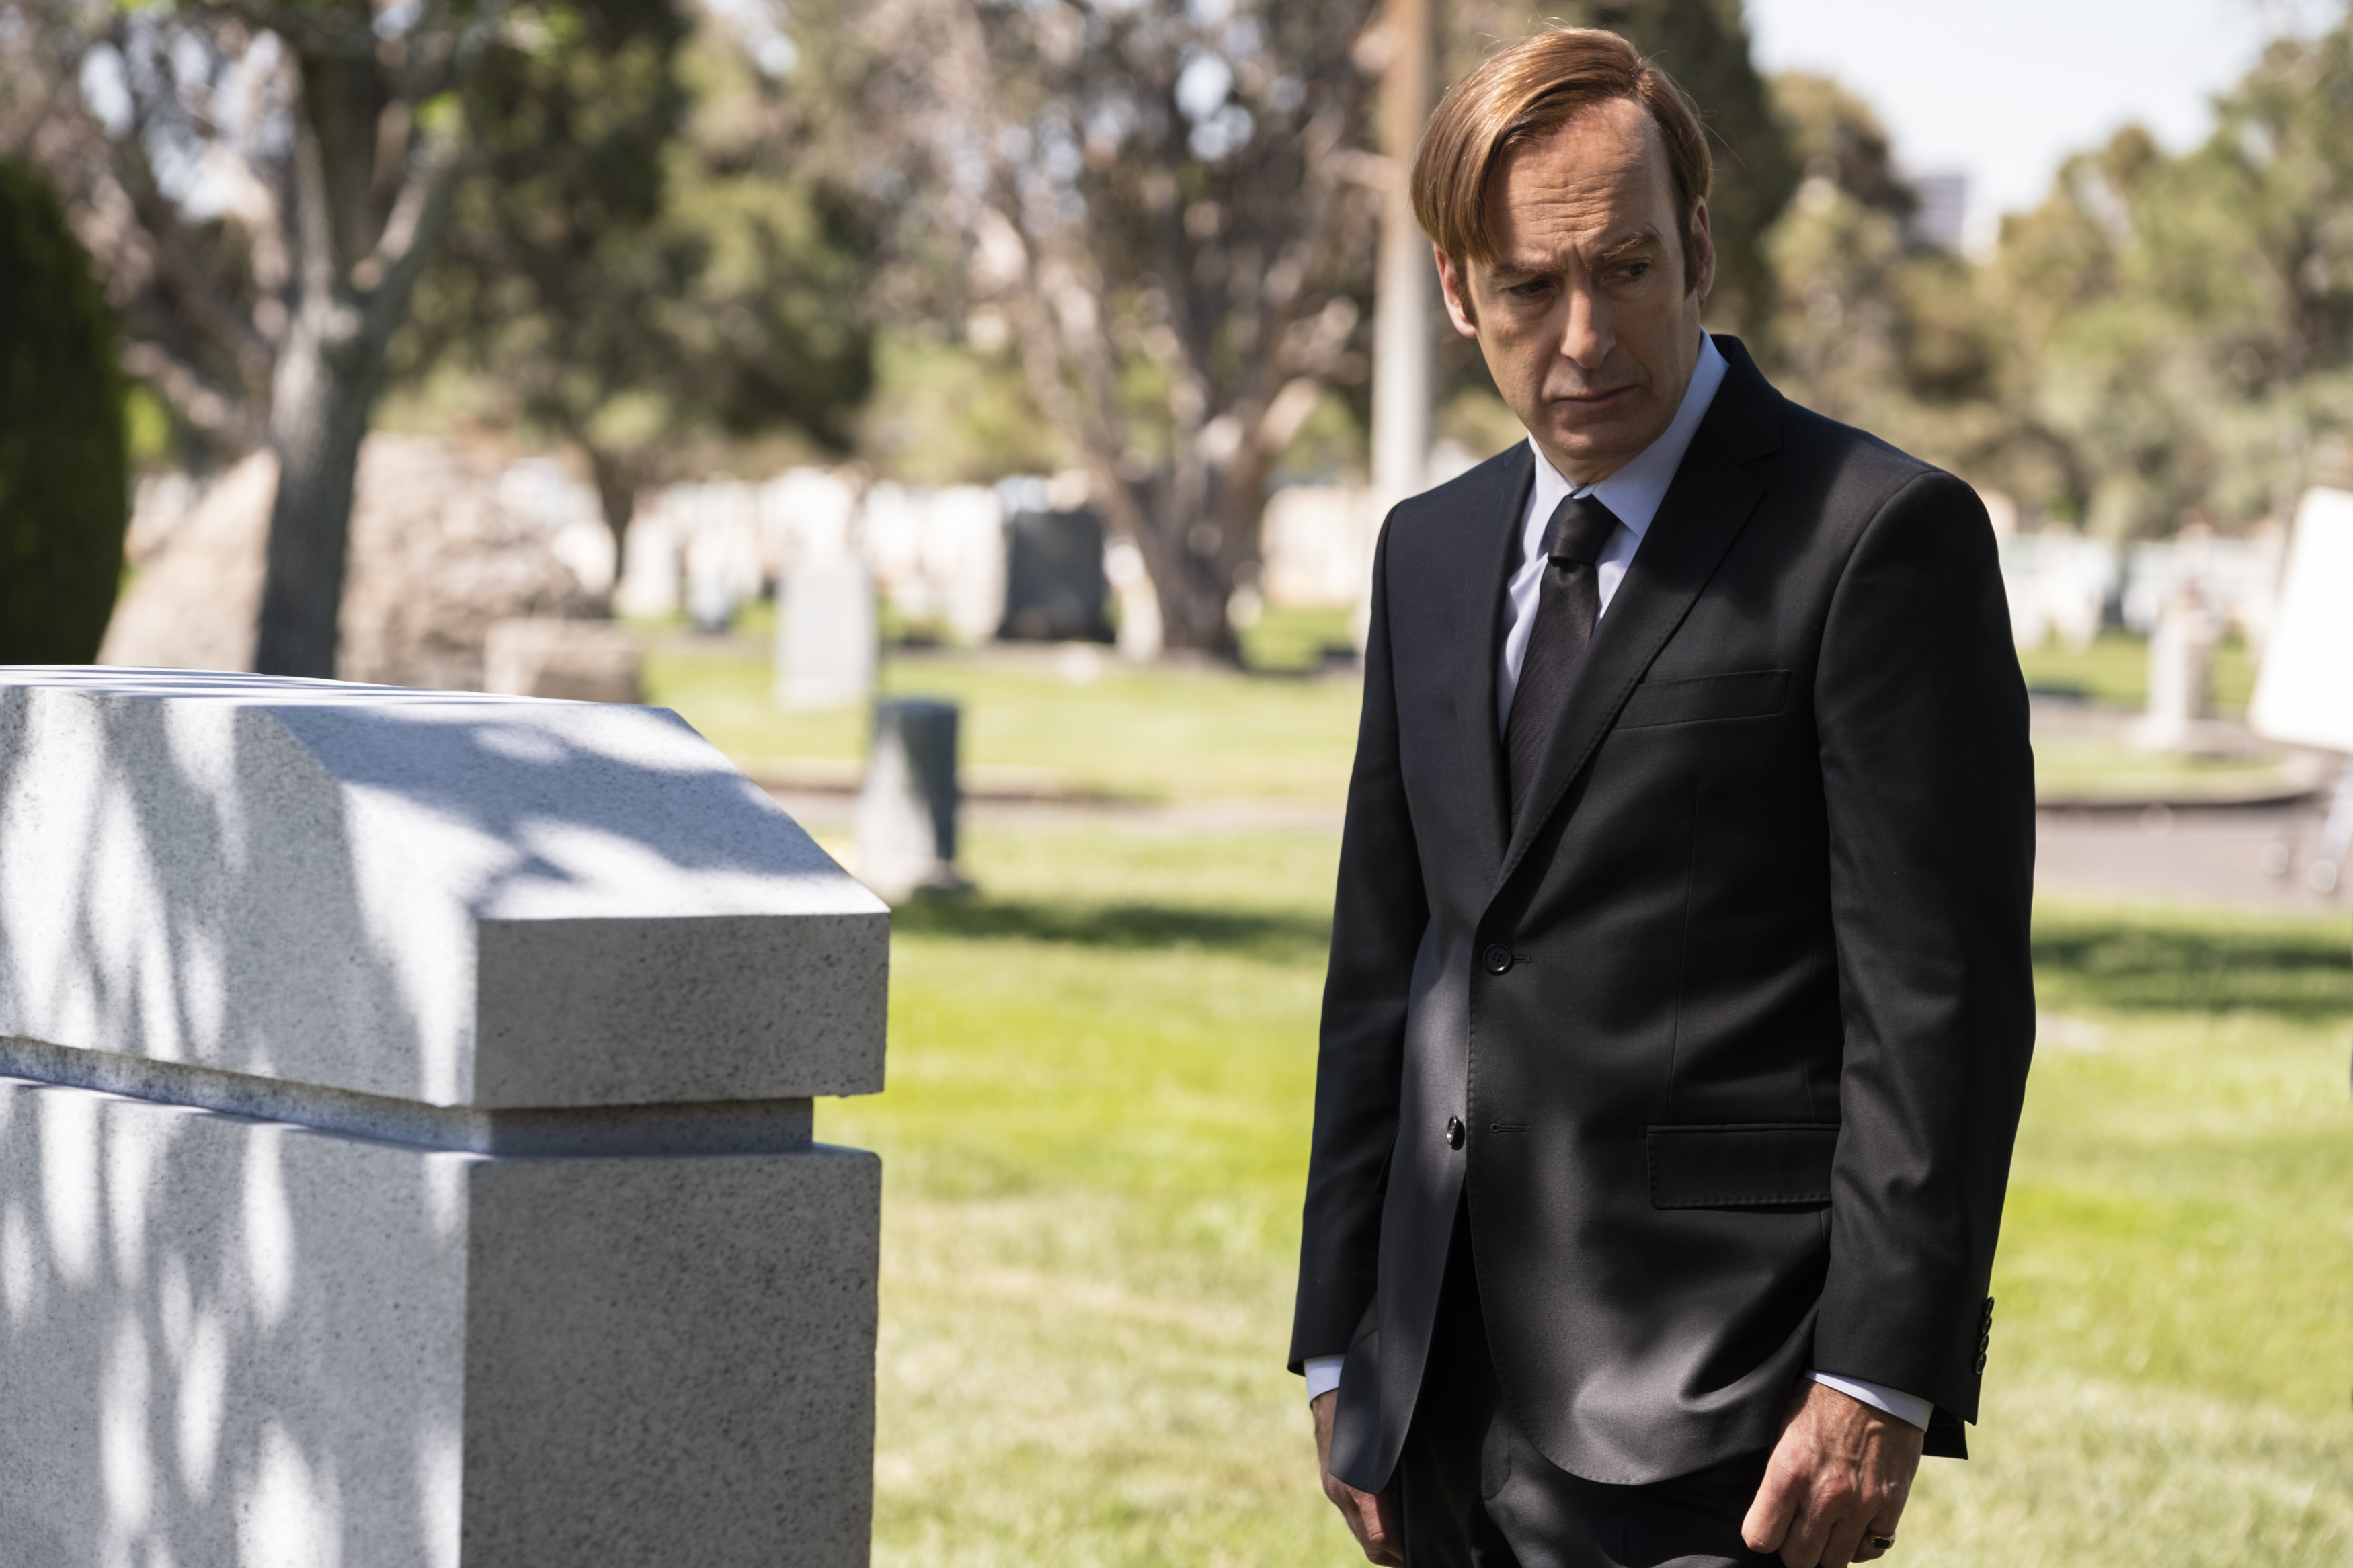 Better Call Saul Season 5 Premiere Date